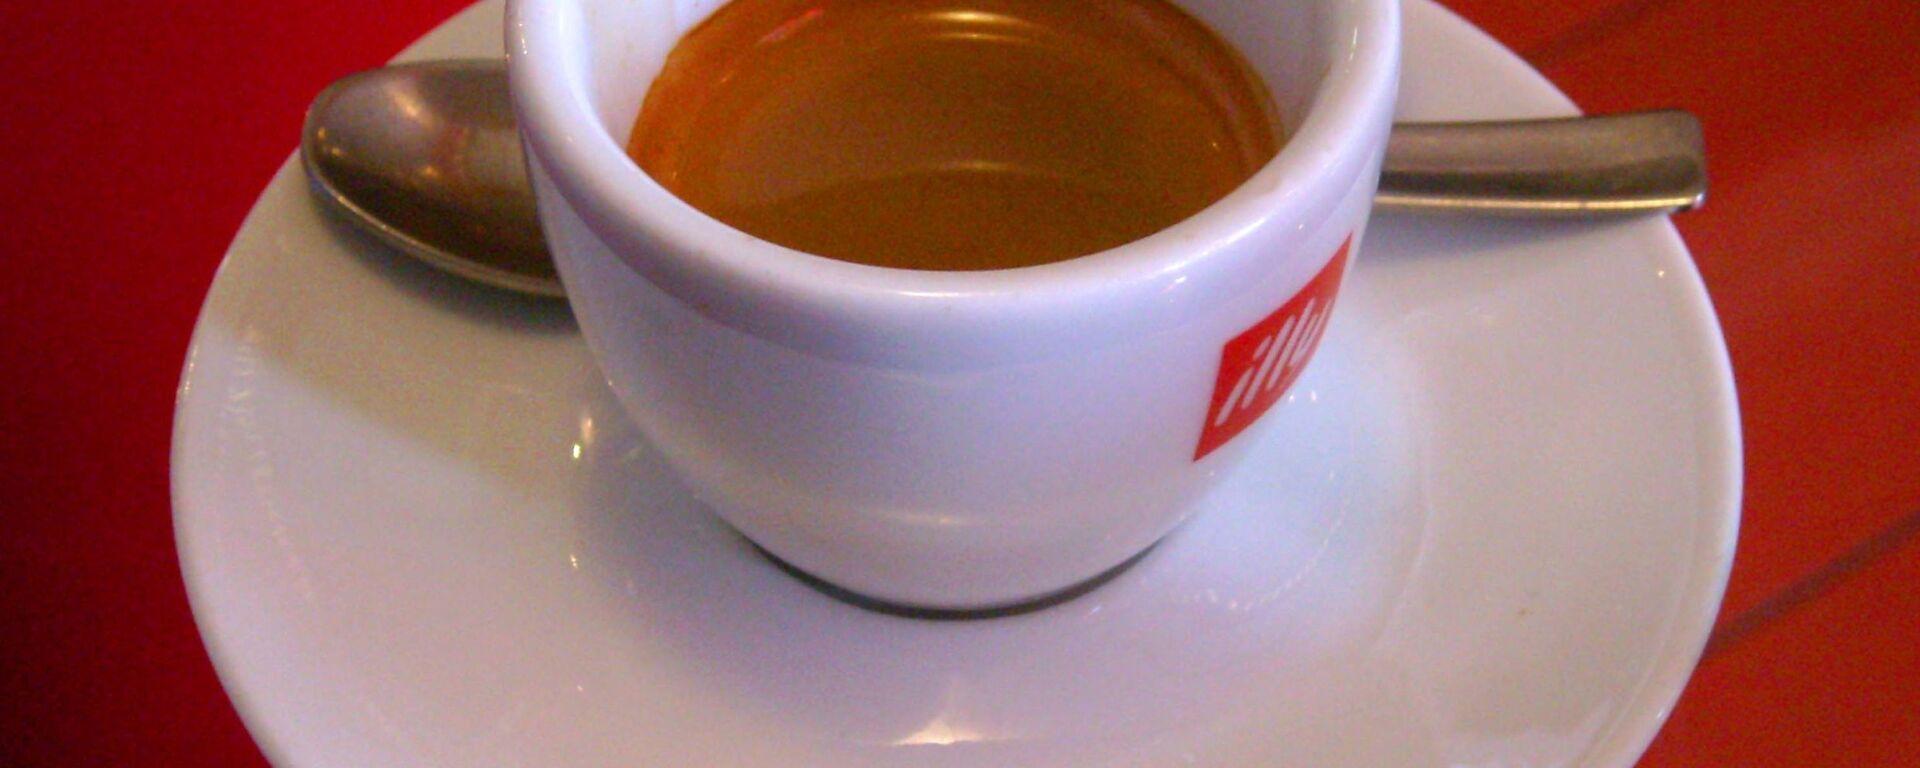 Caffè espresso - Sputnik Italia, 1920, 16.02.2021